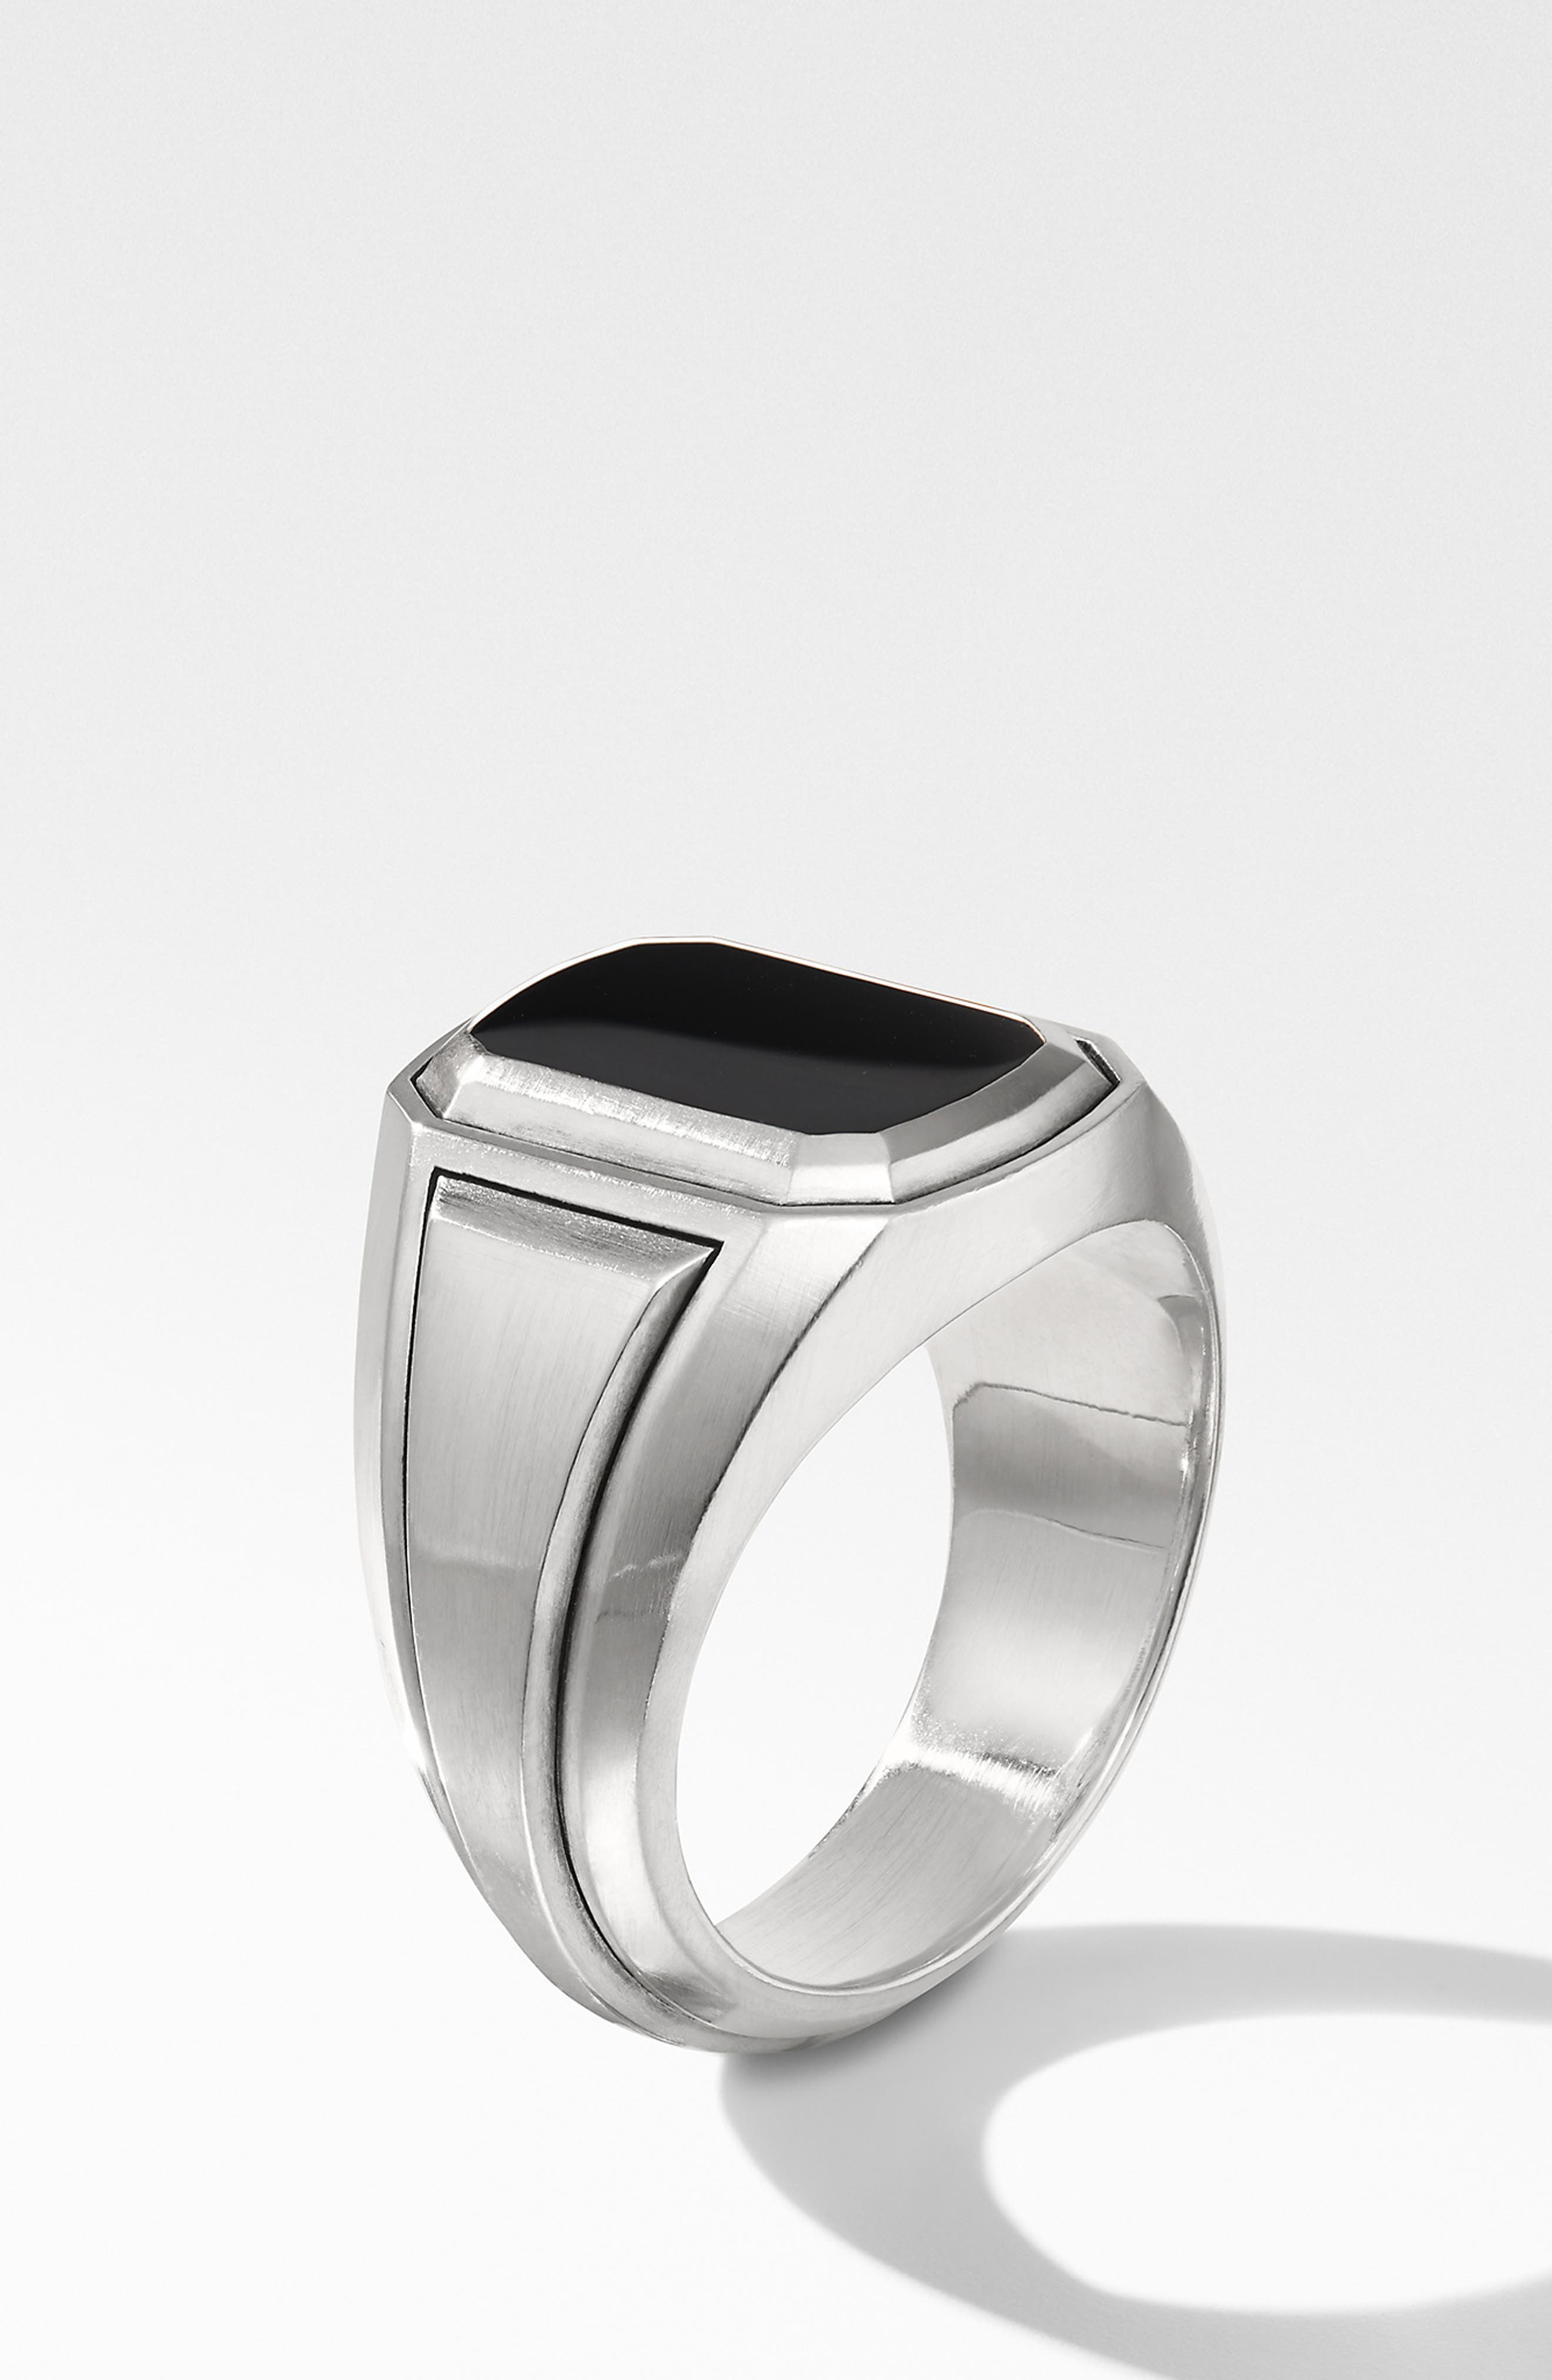 Deco Signet Ring with Black Onyx,                             Alternate thumbnail 2, color,                             BLACK ONYX